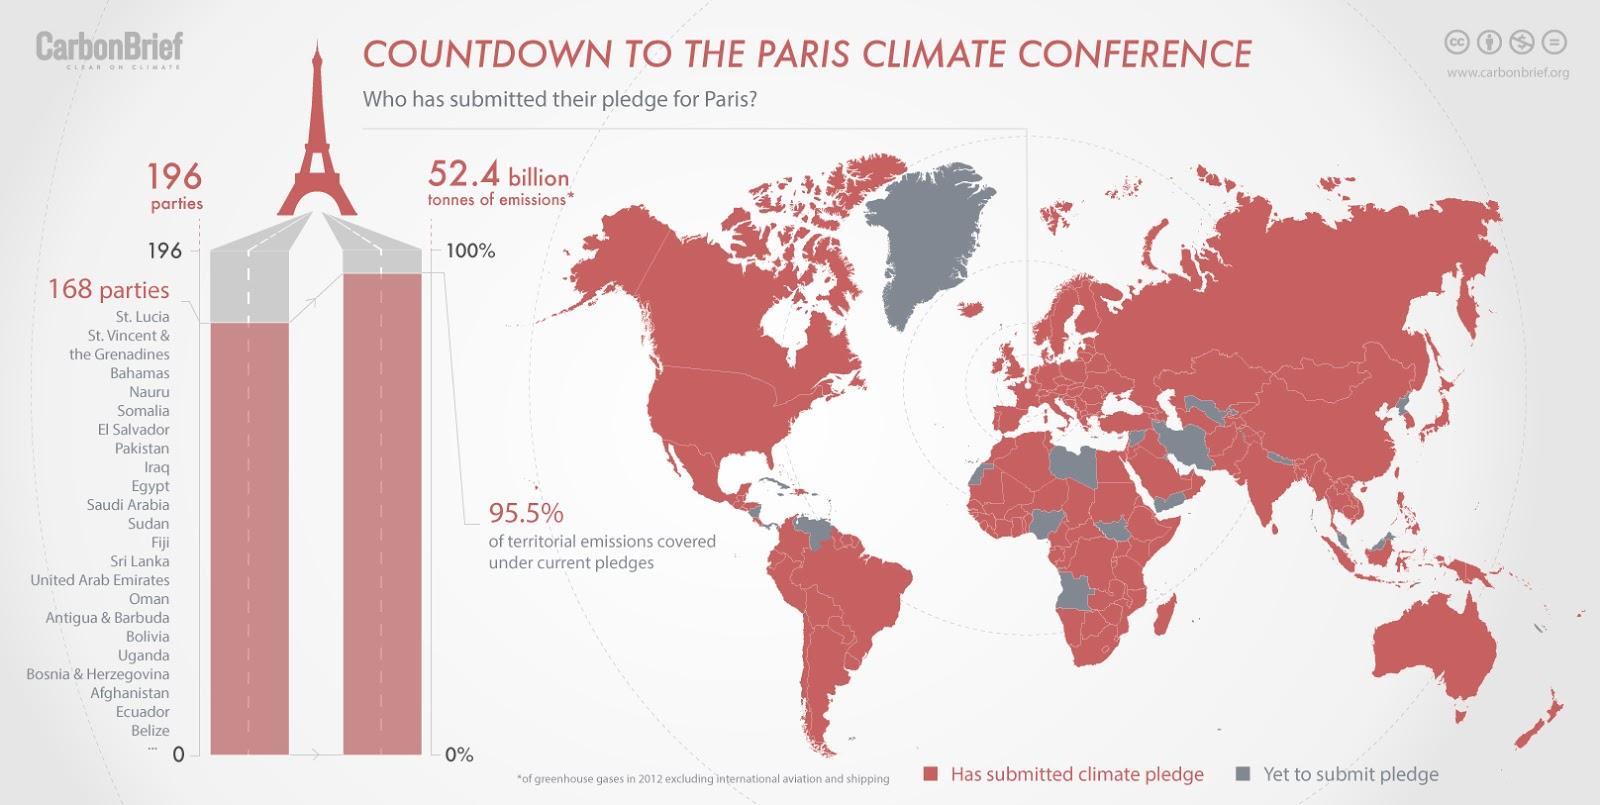 Paris 2015: Tracking country climate pledges